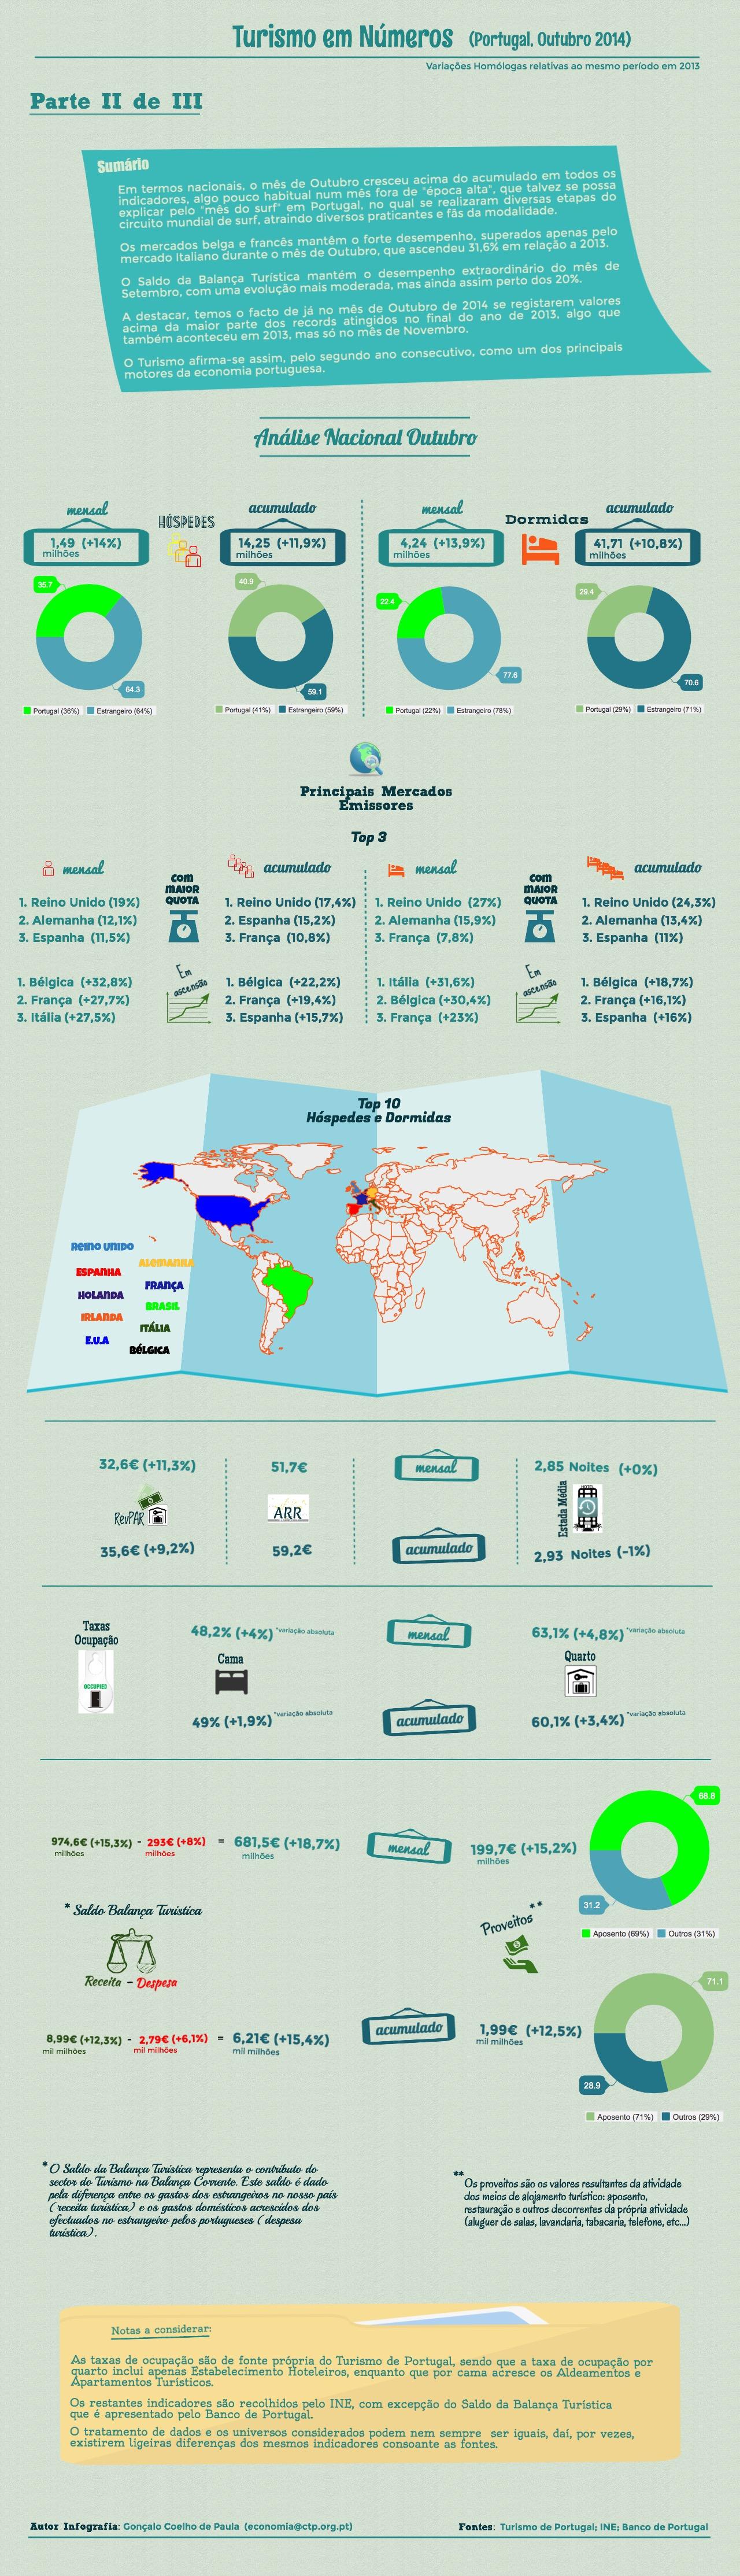 Análise Nacional Outubro 2014 | Piktochart Infographic Editor